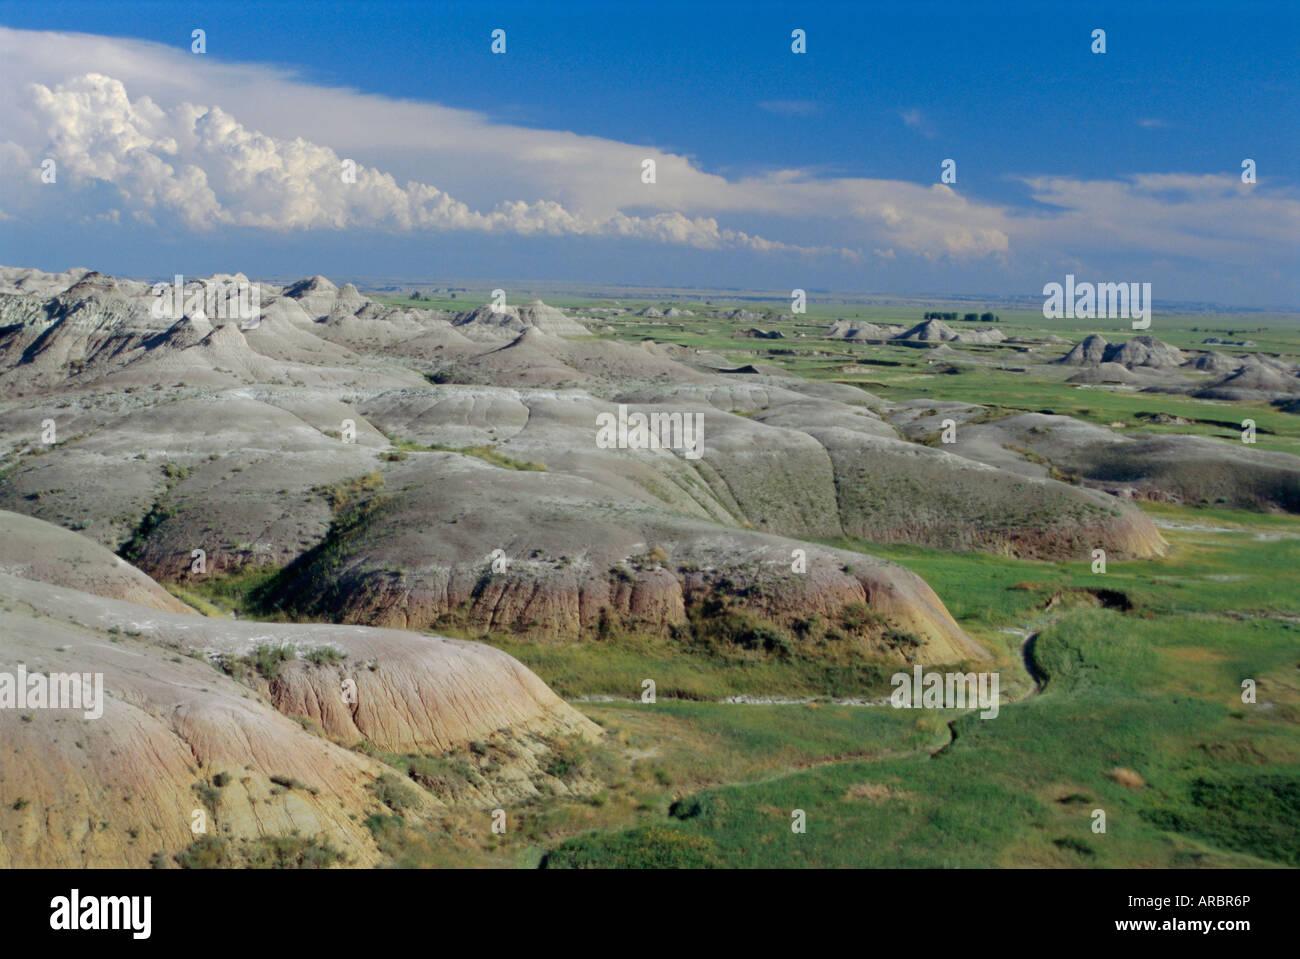 Gullies eroded into the Pierre shales, Badlands National Park, South Dakota, USA - Stock Image